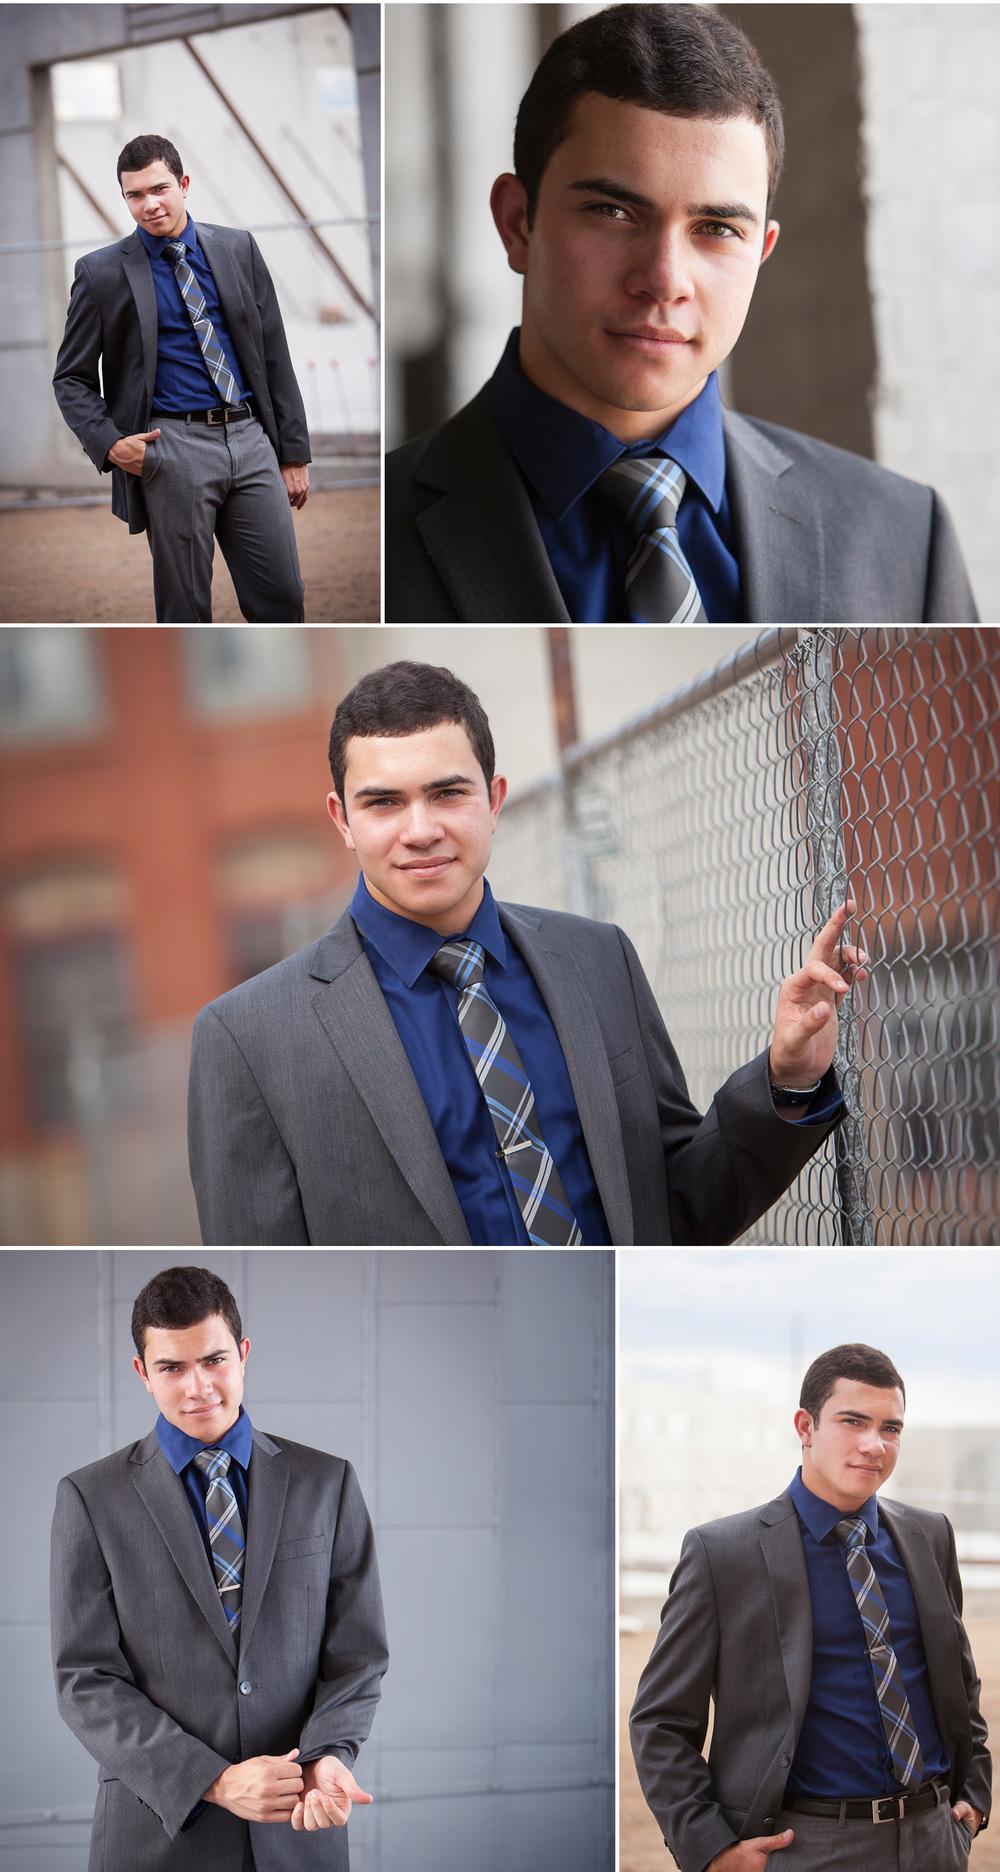 Senior Portraits of guy in suit on industrial campus, with Denver photographer Jennifer Koskinen of Merritt Portrait Studio